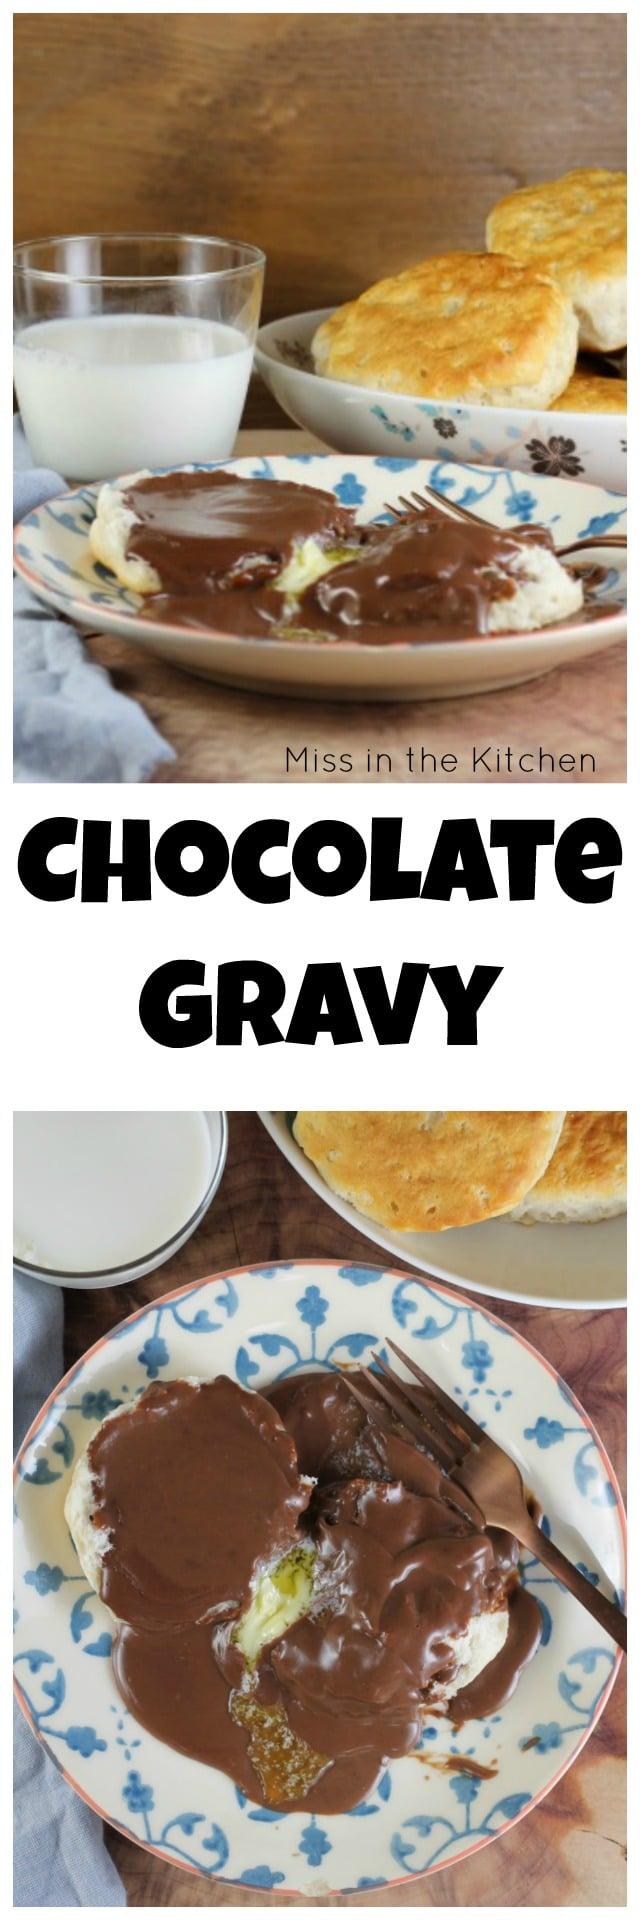 Homemade Chocolate Gravy Recipe from MissintheKitchen.com